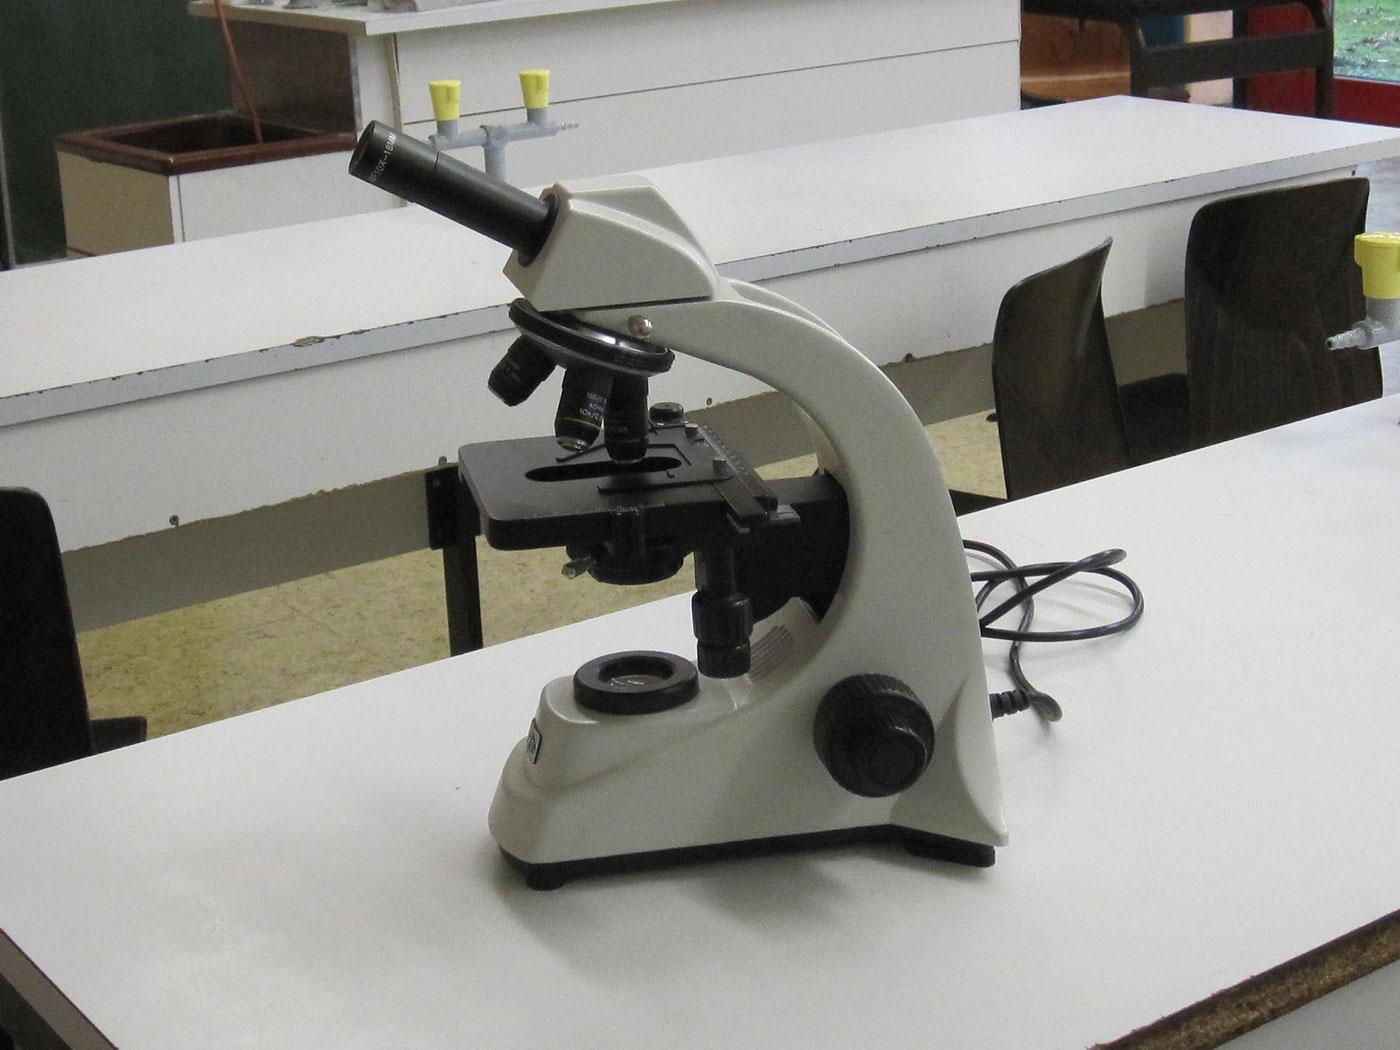 Kinder die mikroskop studing biologie chemie im schullabor